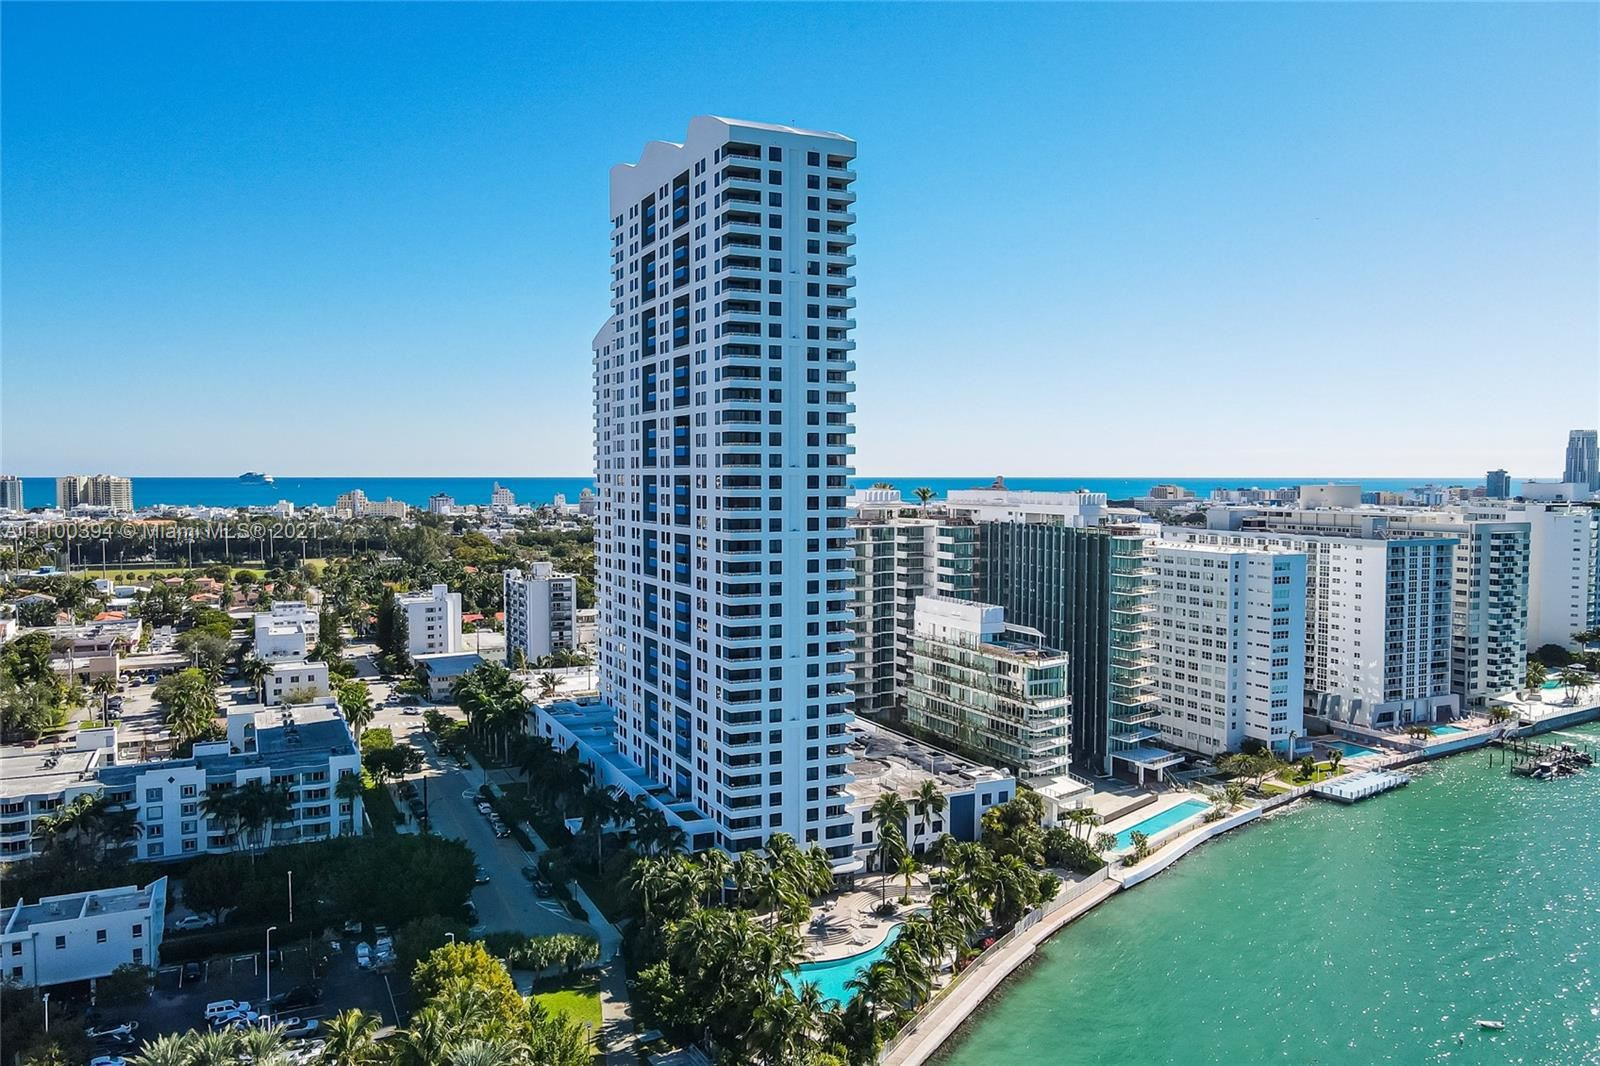 1330 West Ave #1614, Miami Beach, FL 33139 - #: A11100394